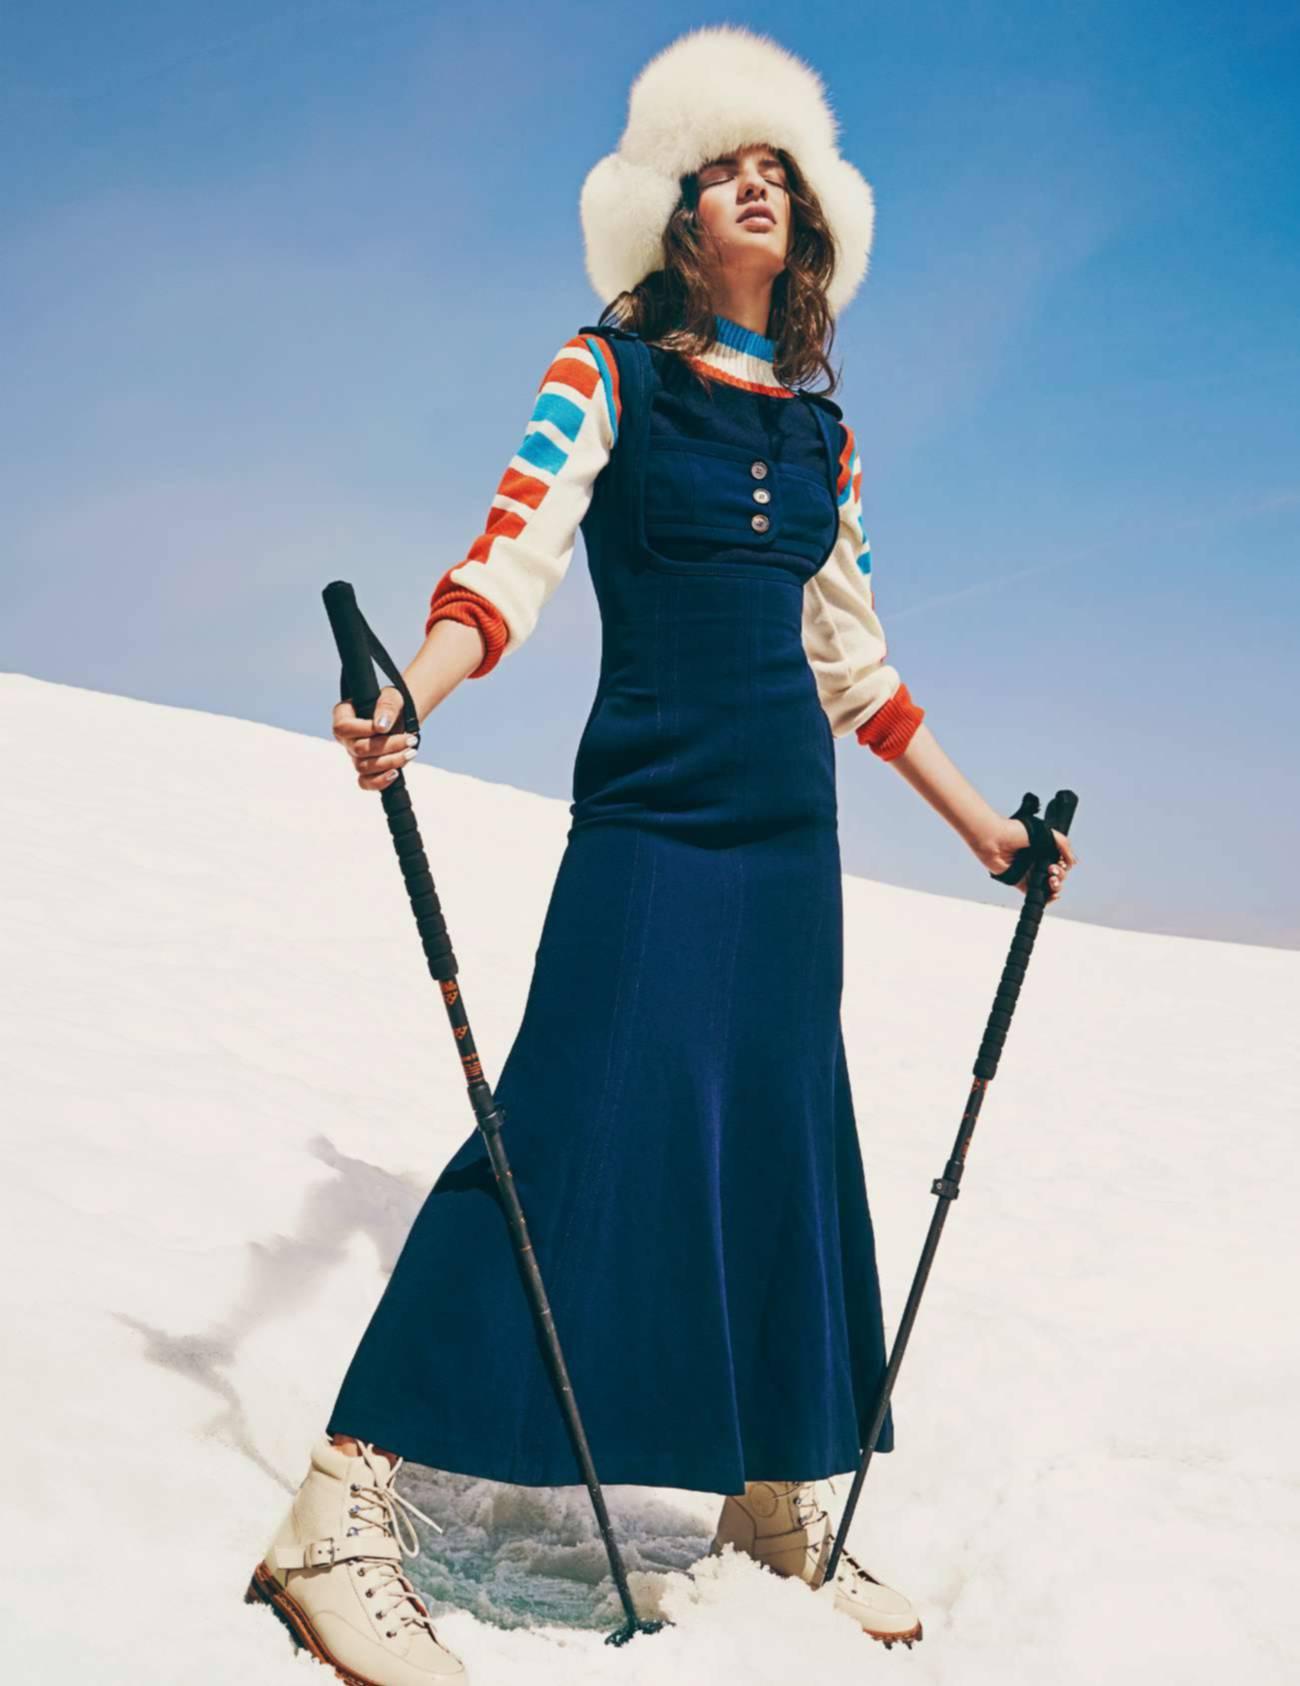 платье, Alessandra Rich; свитер, Valentine Gauthier; шапка-ушанка, Sprung Frères; ботинки, Hermès; лыжные палки, Black Crows